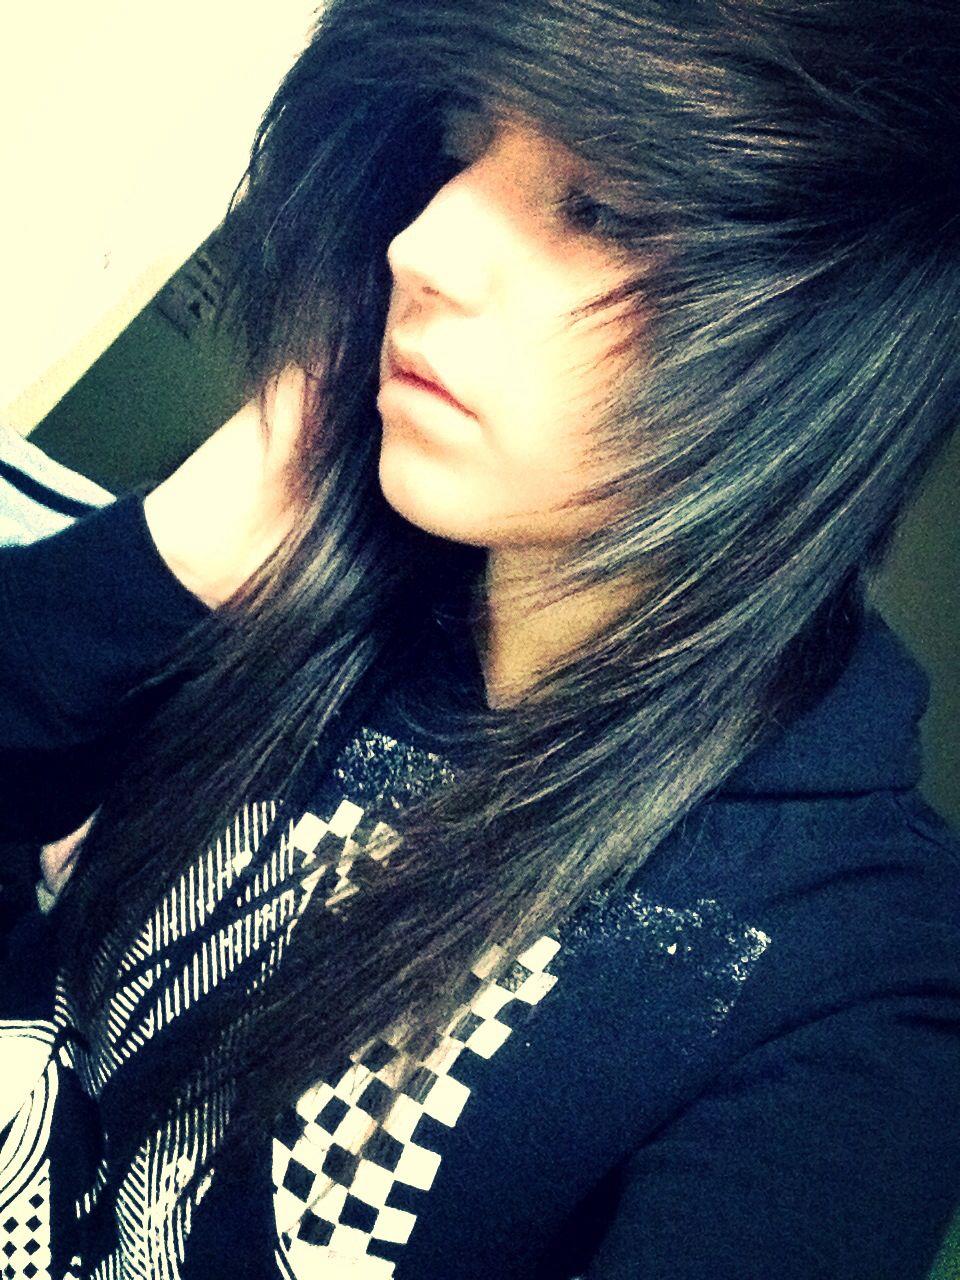 Pin by harley woodham on hair u beauty that i love pinterest emo